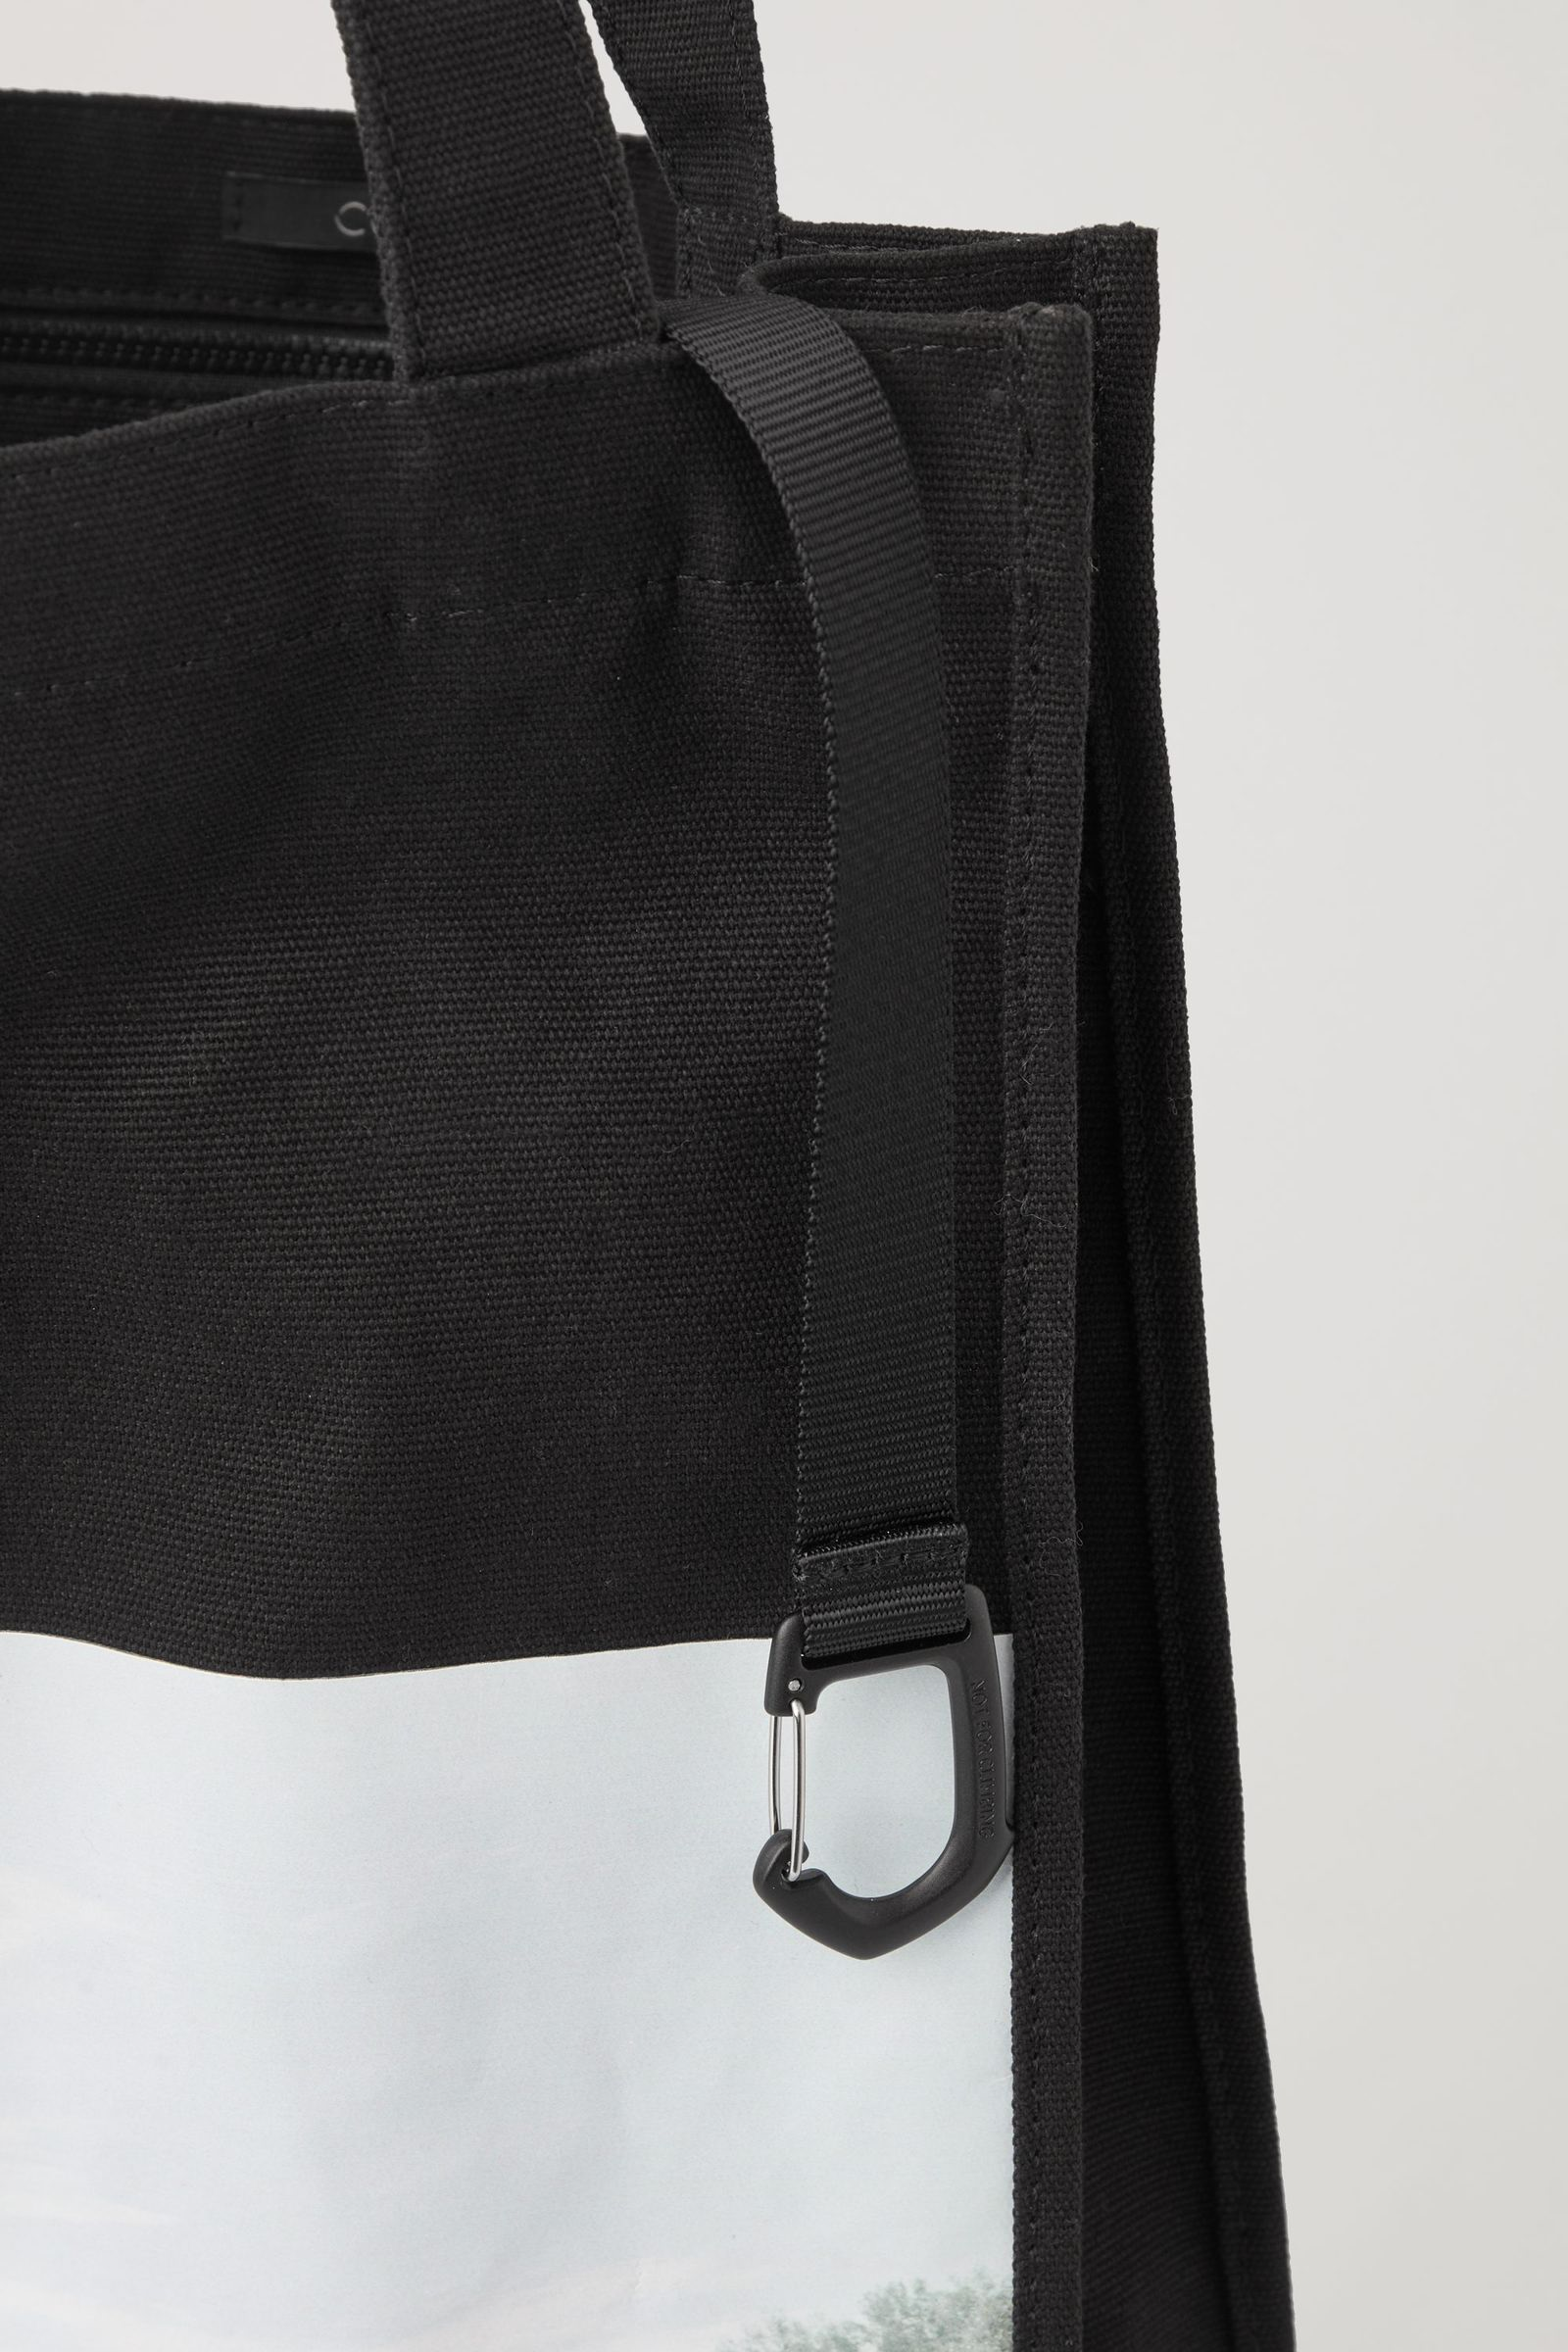 COS 포토 프린트 캔버스 토트백의 블랙 / 그레이컬러 Detail입니다.